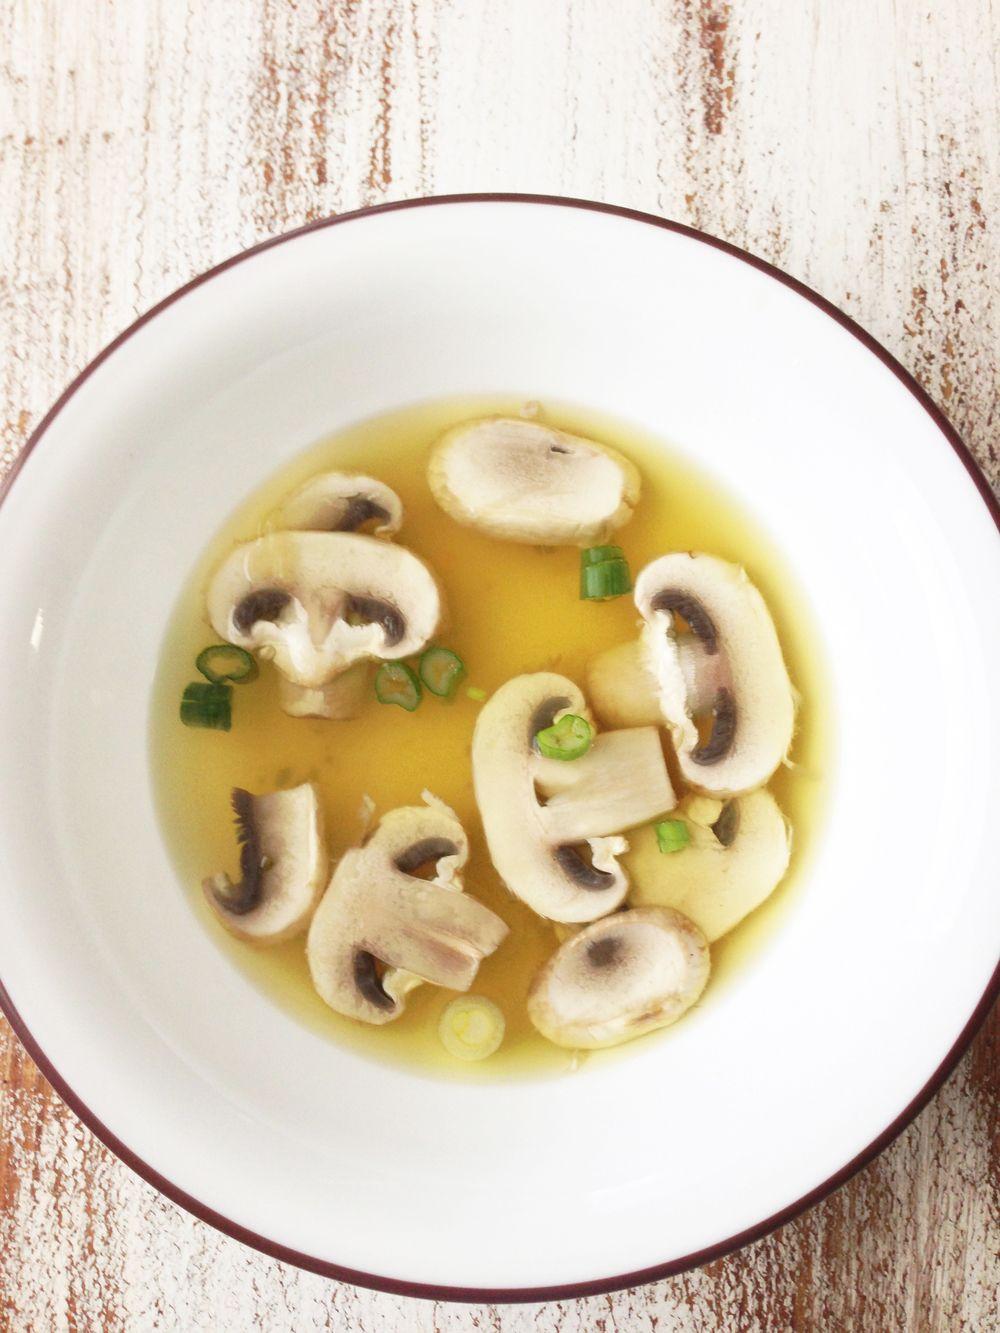 Crock Pot Japanese Onion Soup Cooking Recipes Japanese Onion Soups Food